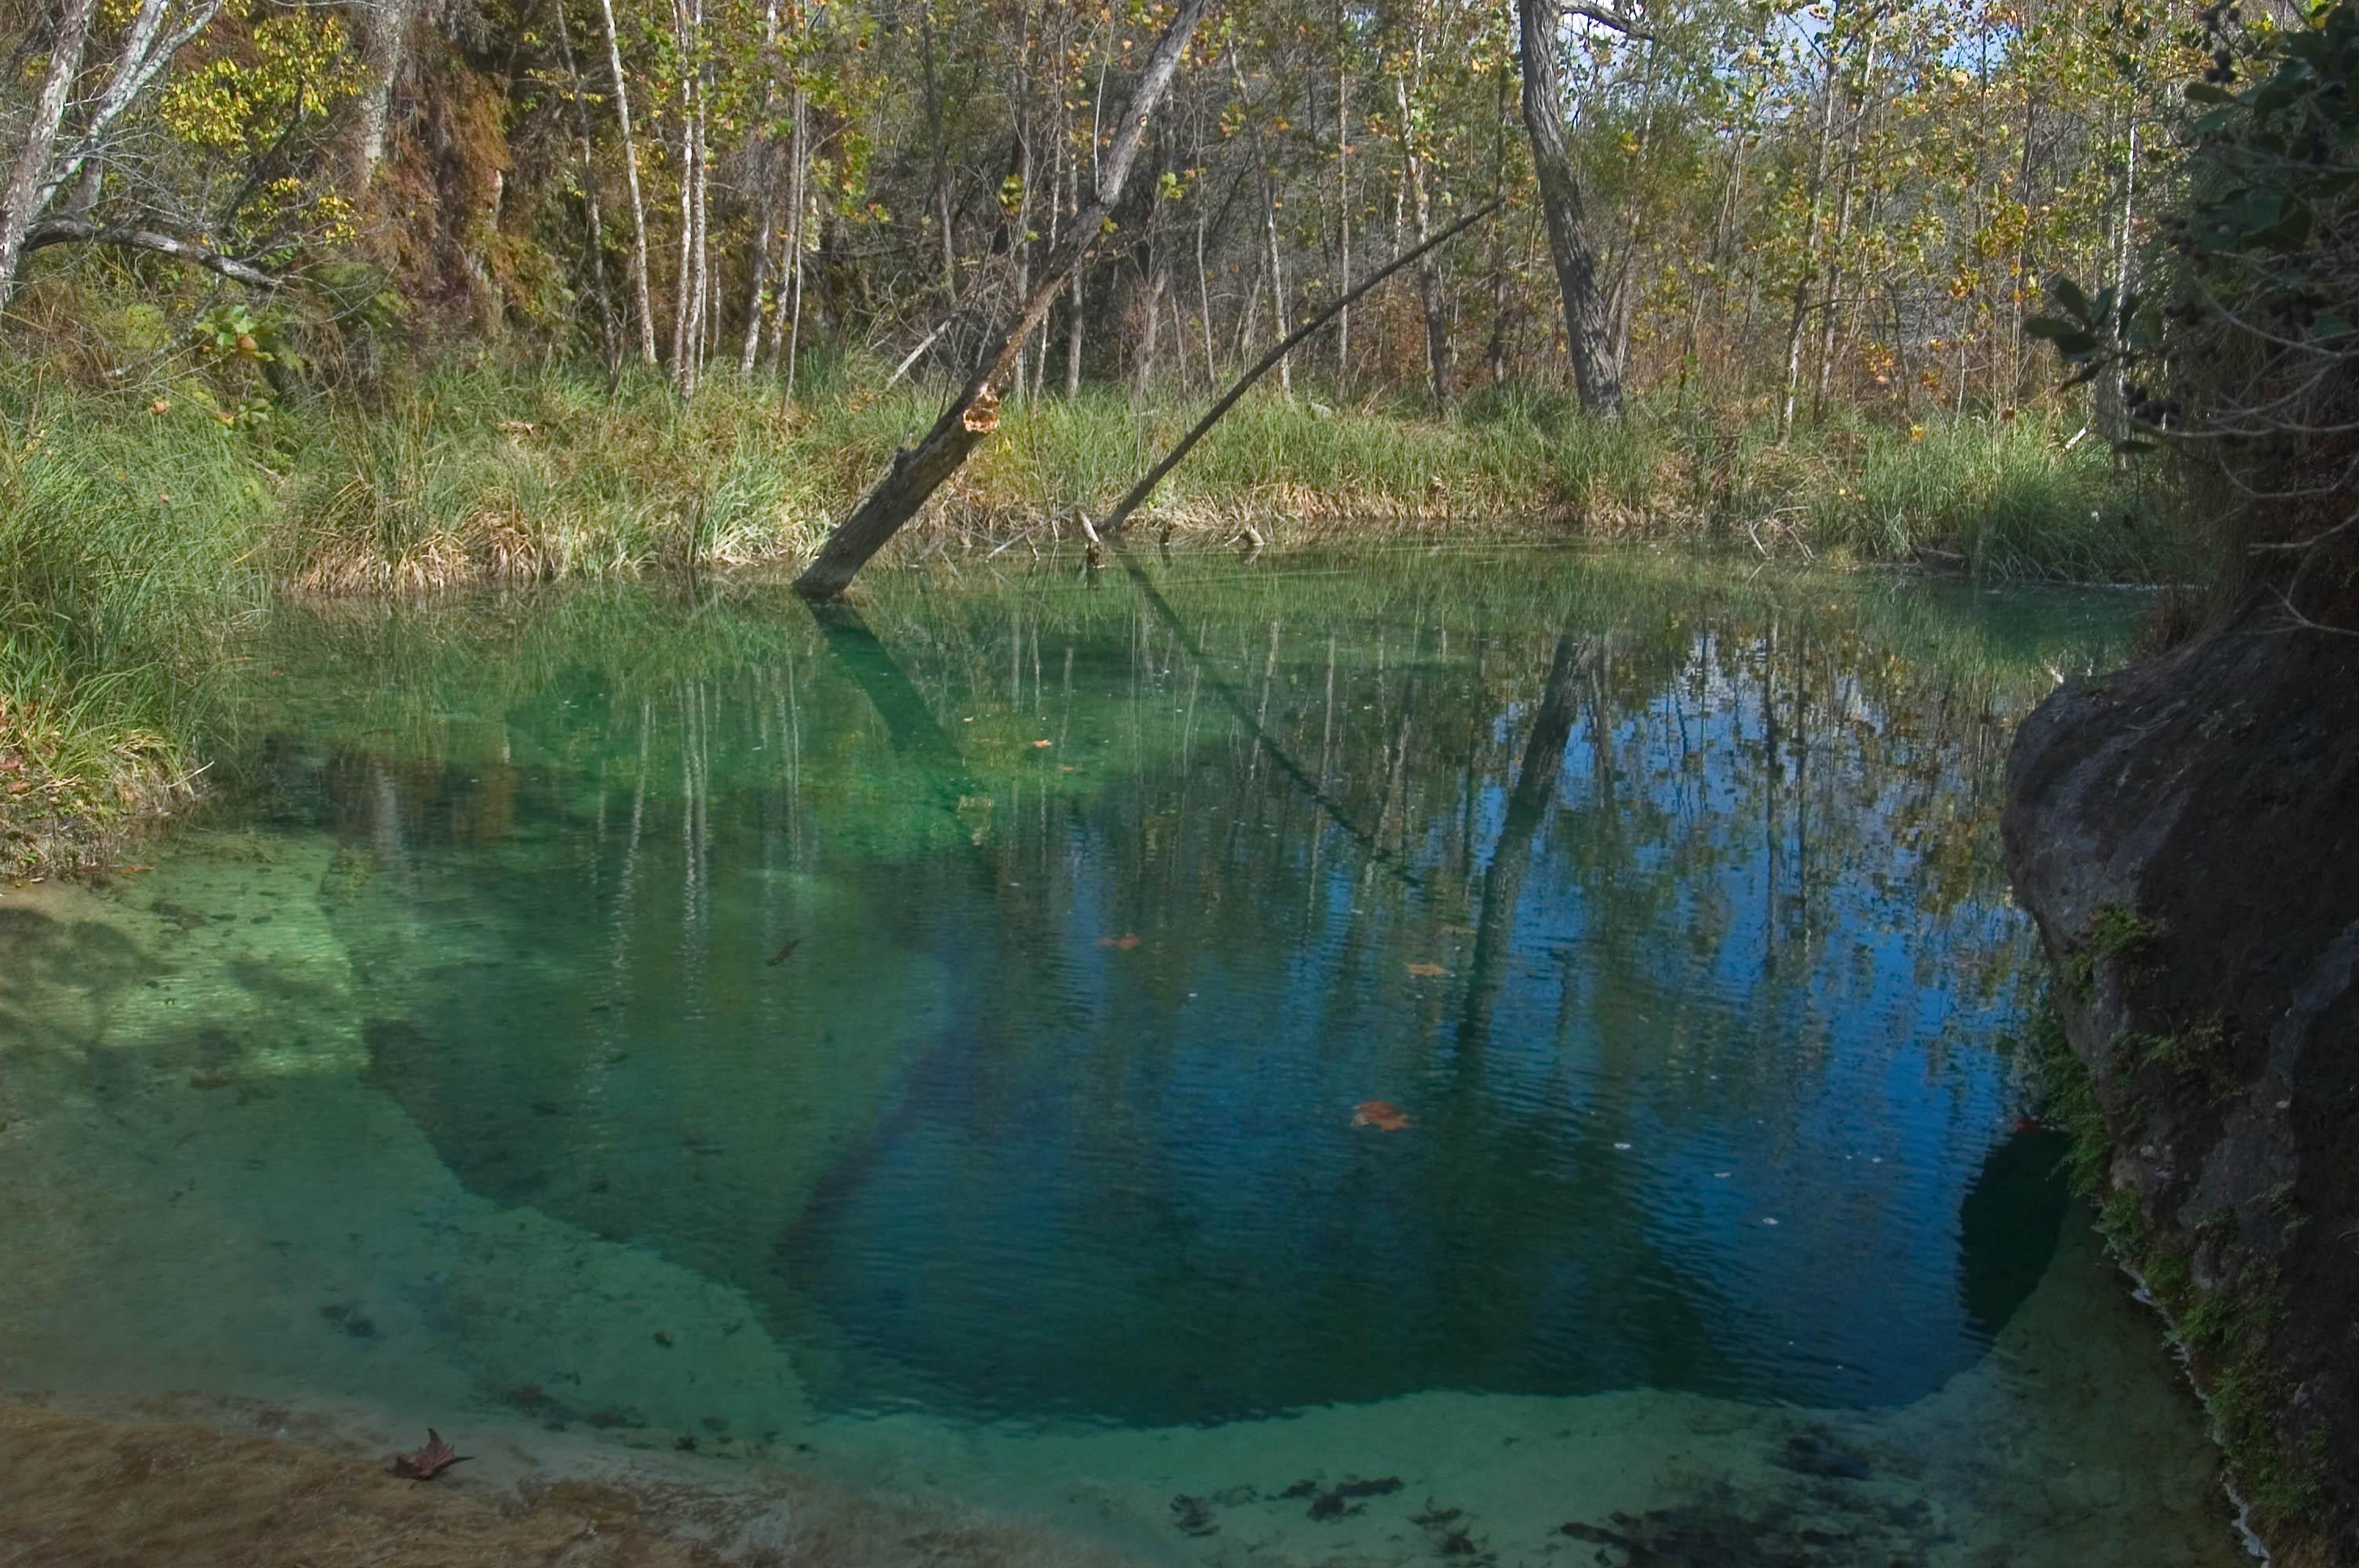 Photo 603-16: Turquois pool of Bee Creek near Wolf ...